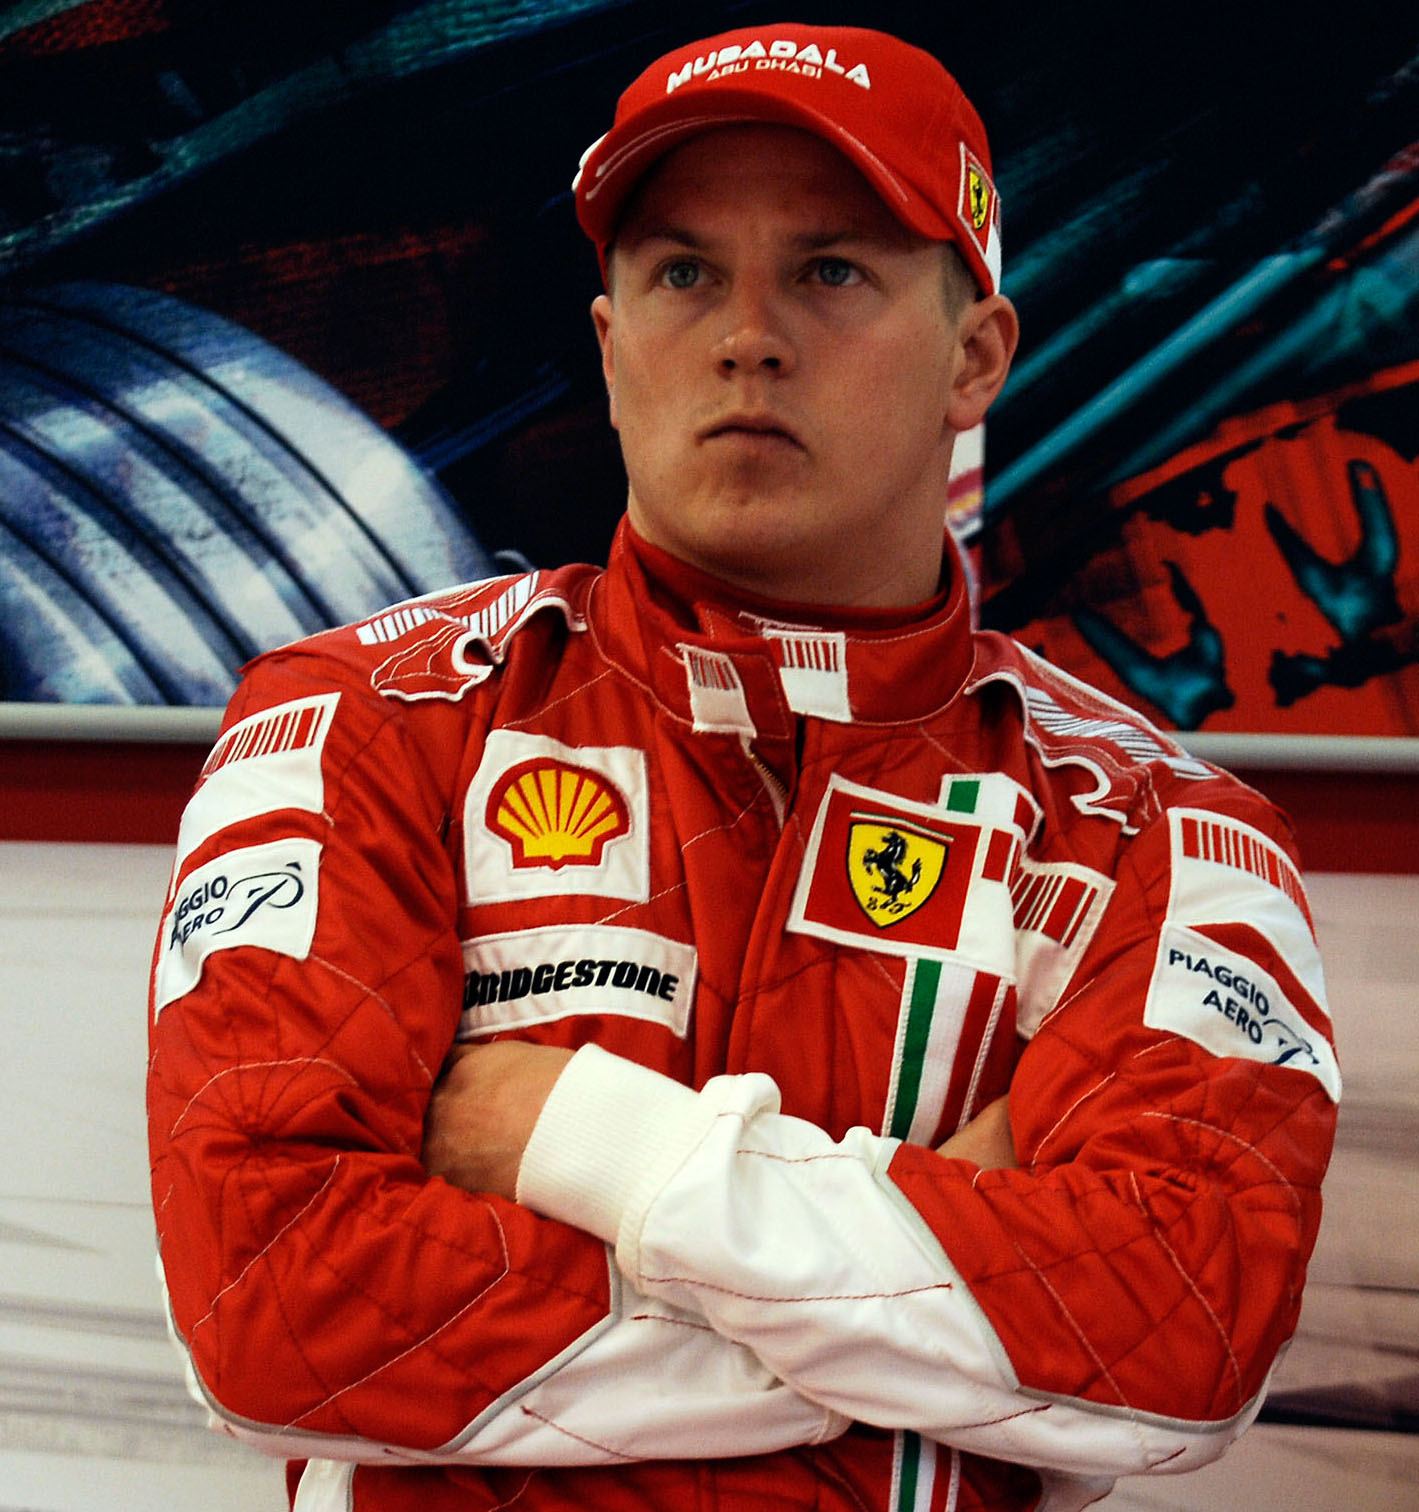 Kimi Raikkonen, pilota Ferrari nel 2014